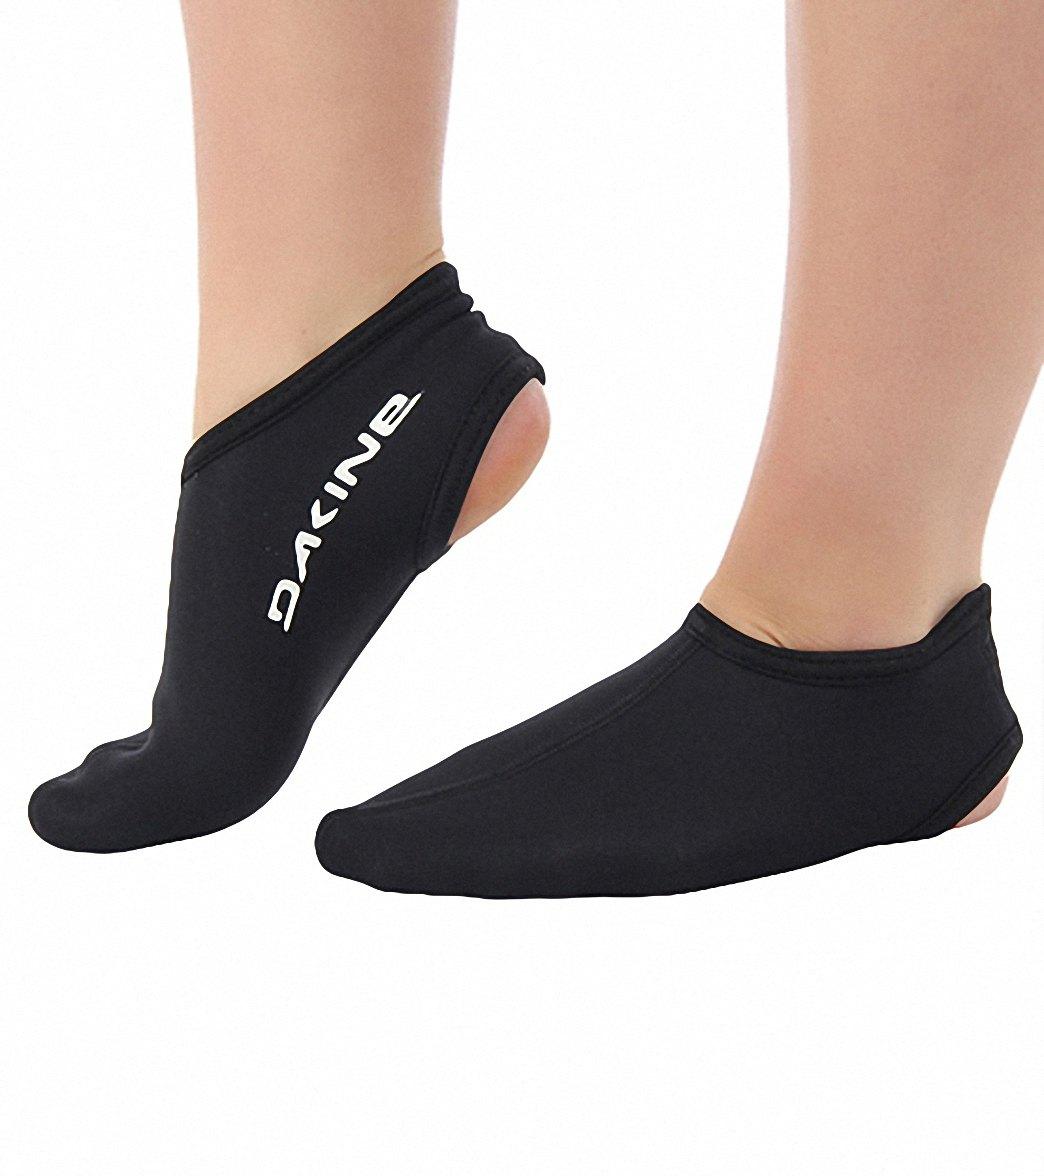 Fins, Footwear & Gloves Dakine Fin Socks Size Large At All Costs